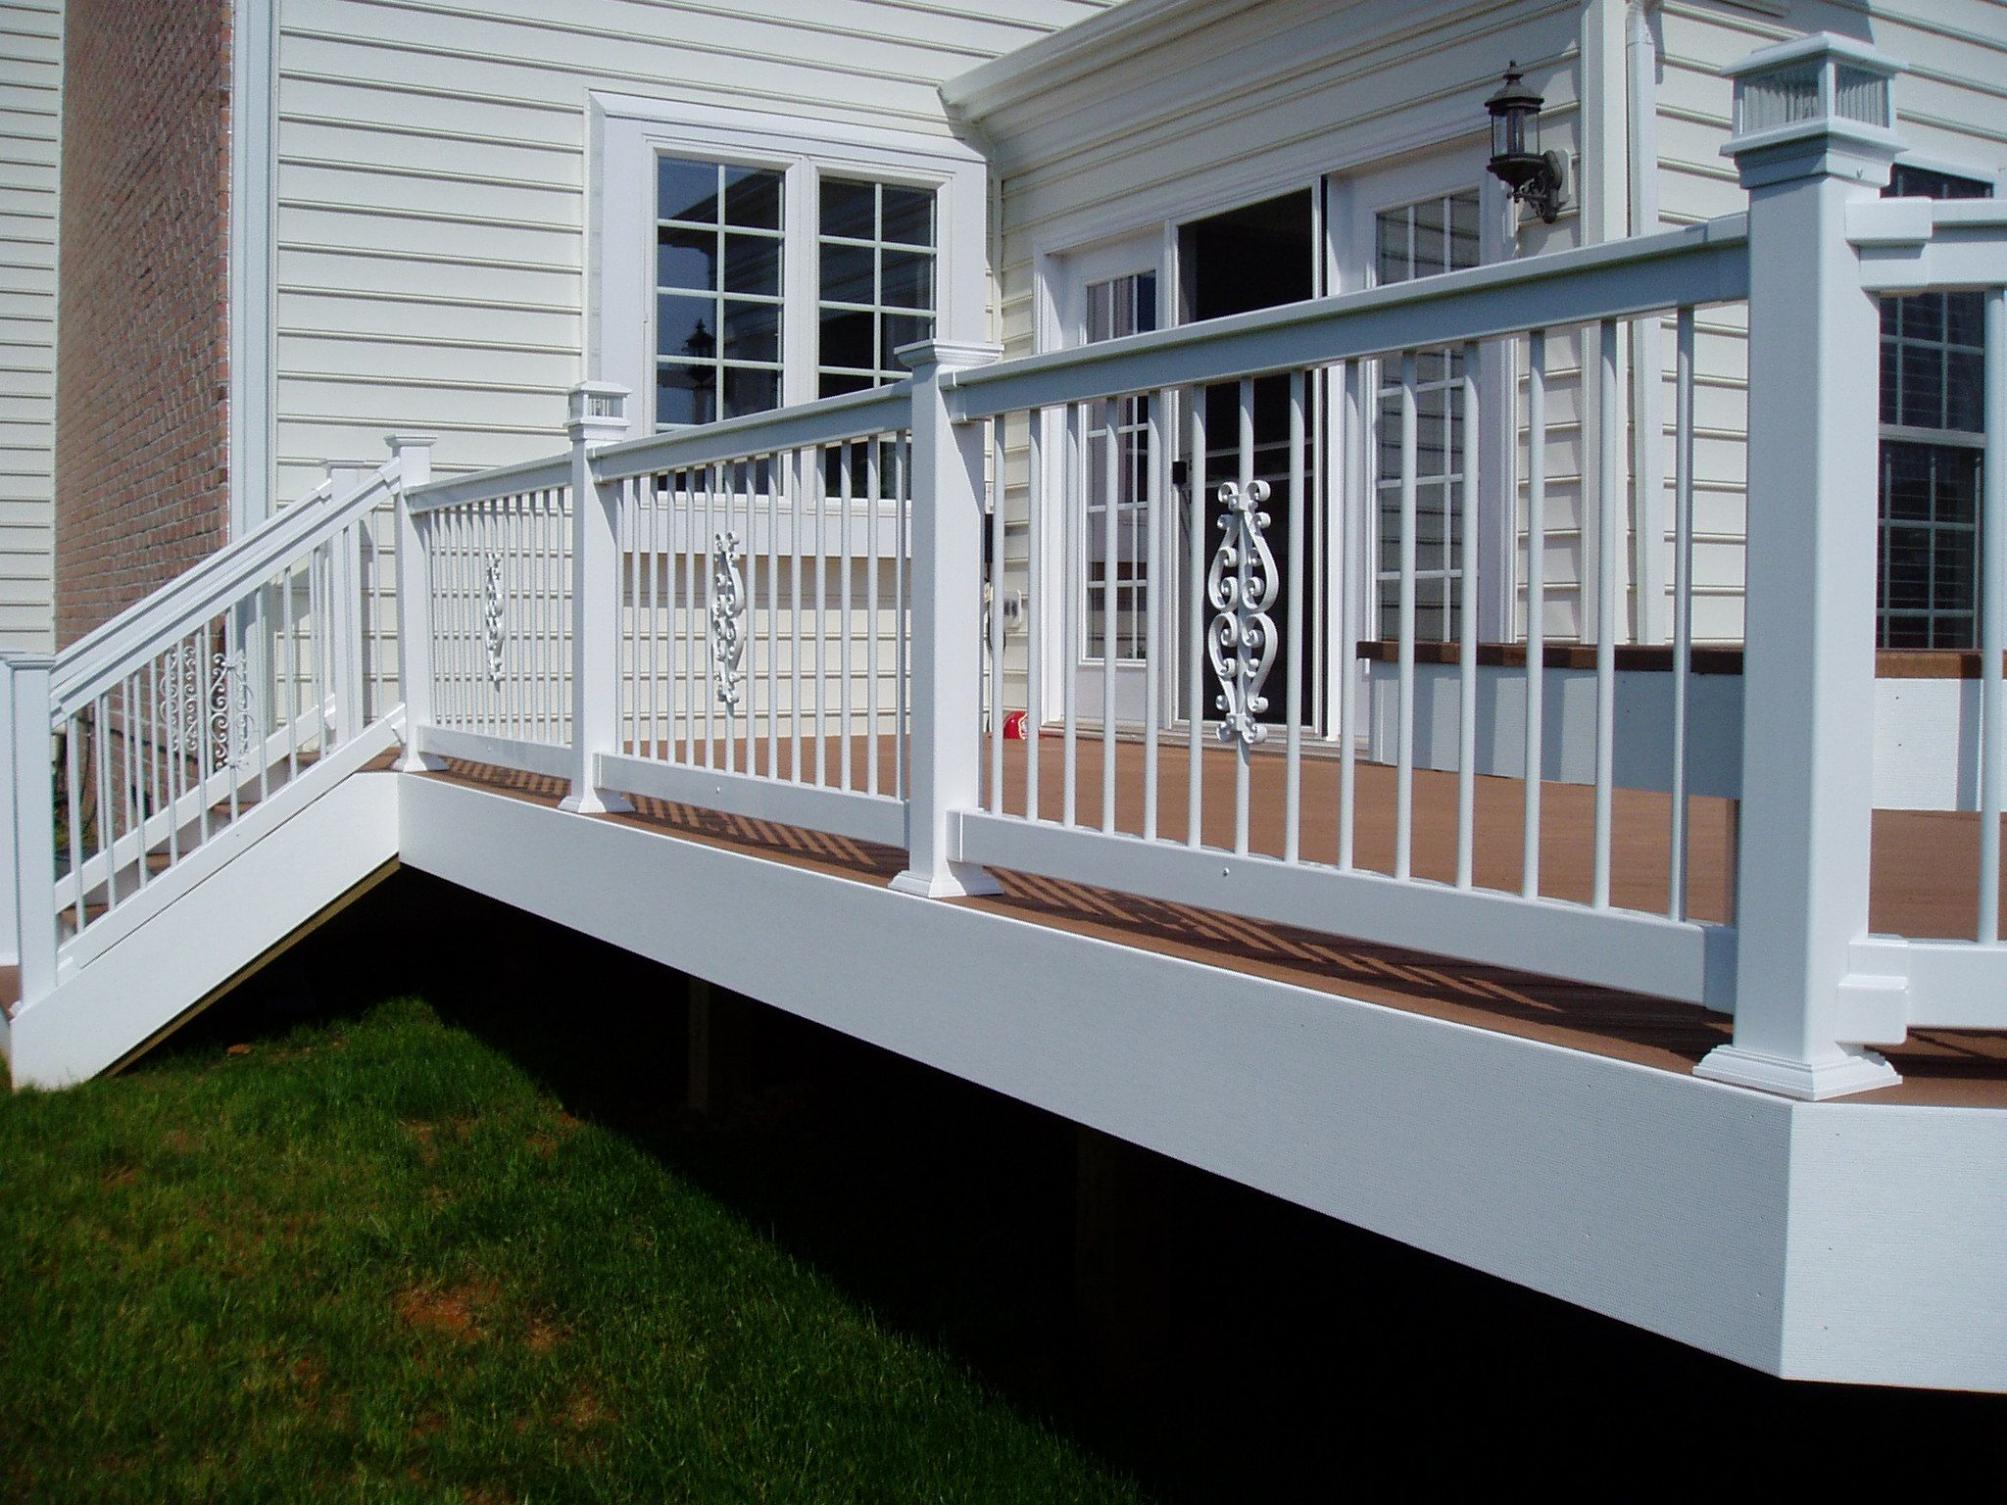 Veranda Decks Deck Railing Height For Veranda Deck Railing Greenite within dimensions 2007 X 1505